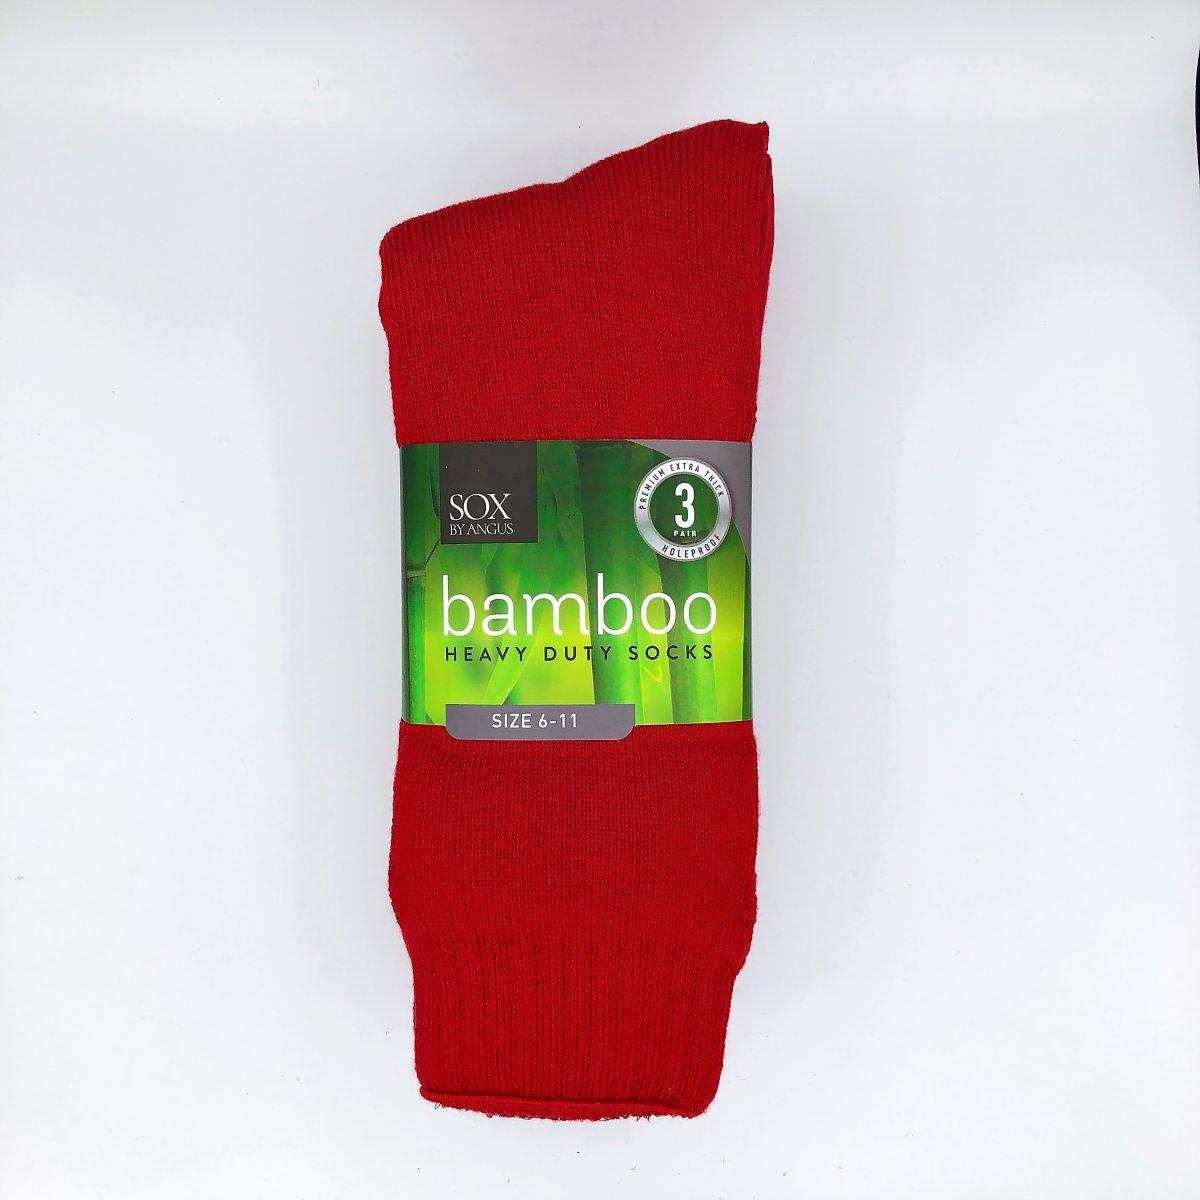 Bamboo Heavy Duty Socks - 3 Pairs Pack - Red